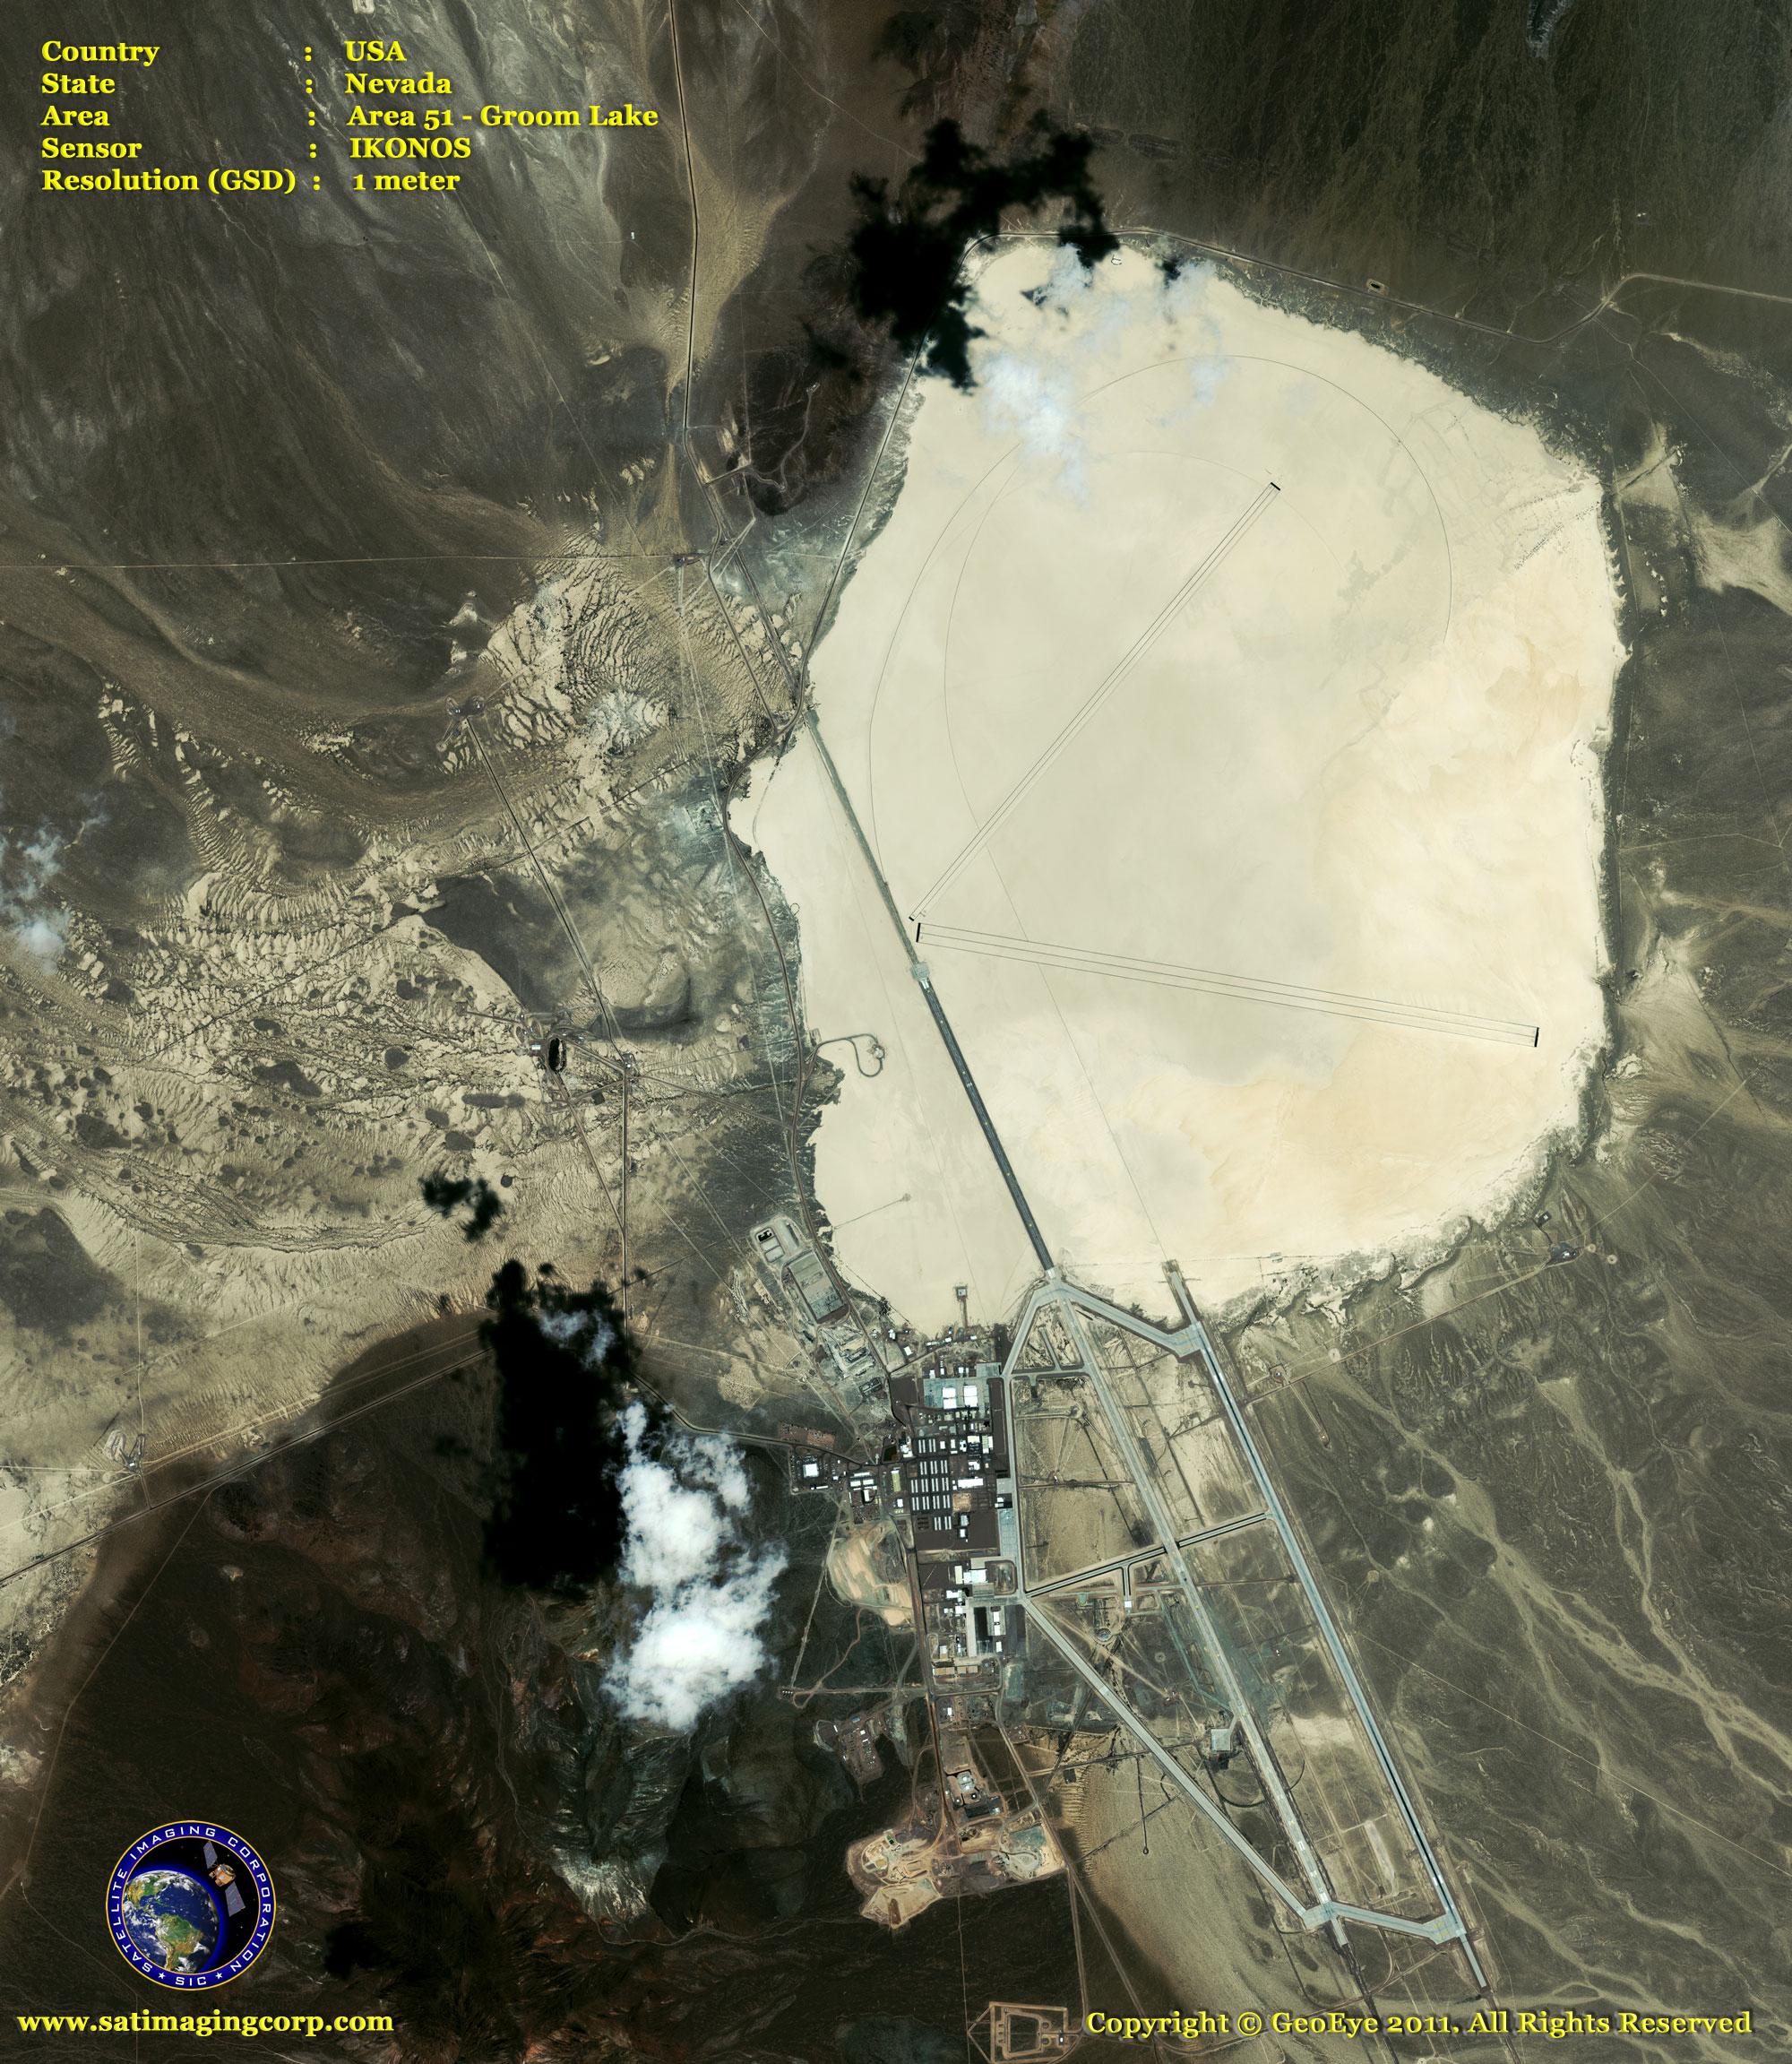 IKONOS Satellite Image Of Area Satellite Imaging Corp - Satellite picture of